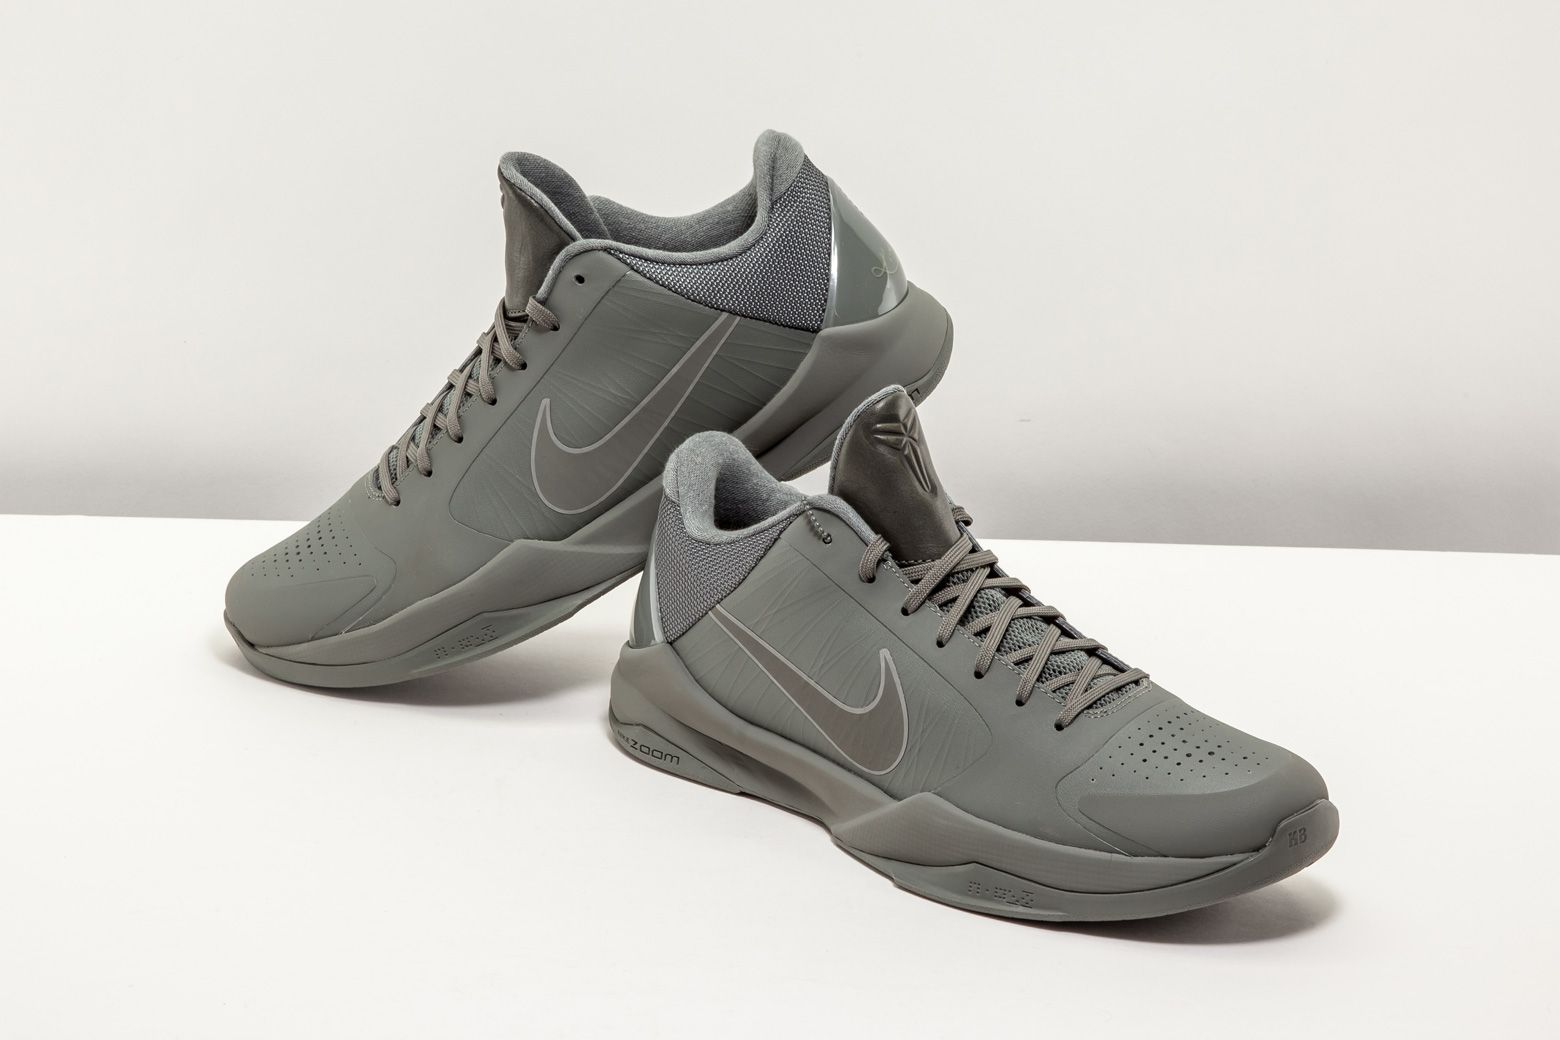 Nike, Kobe bryant signature, Nike zoom kobe